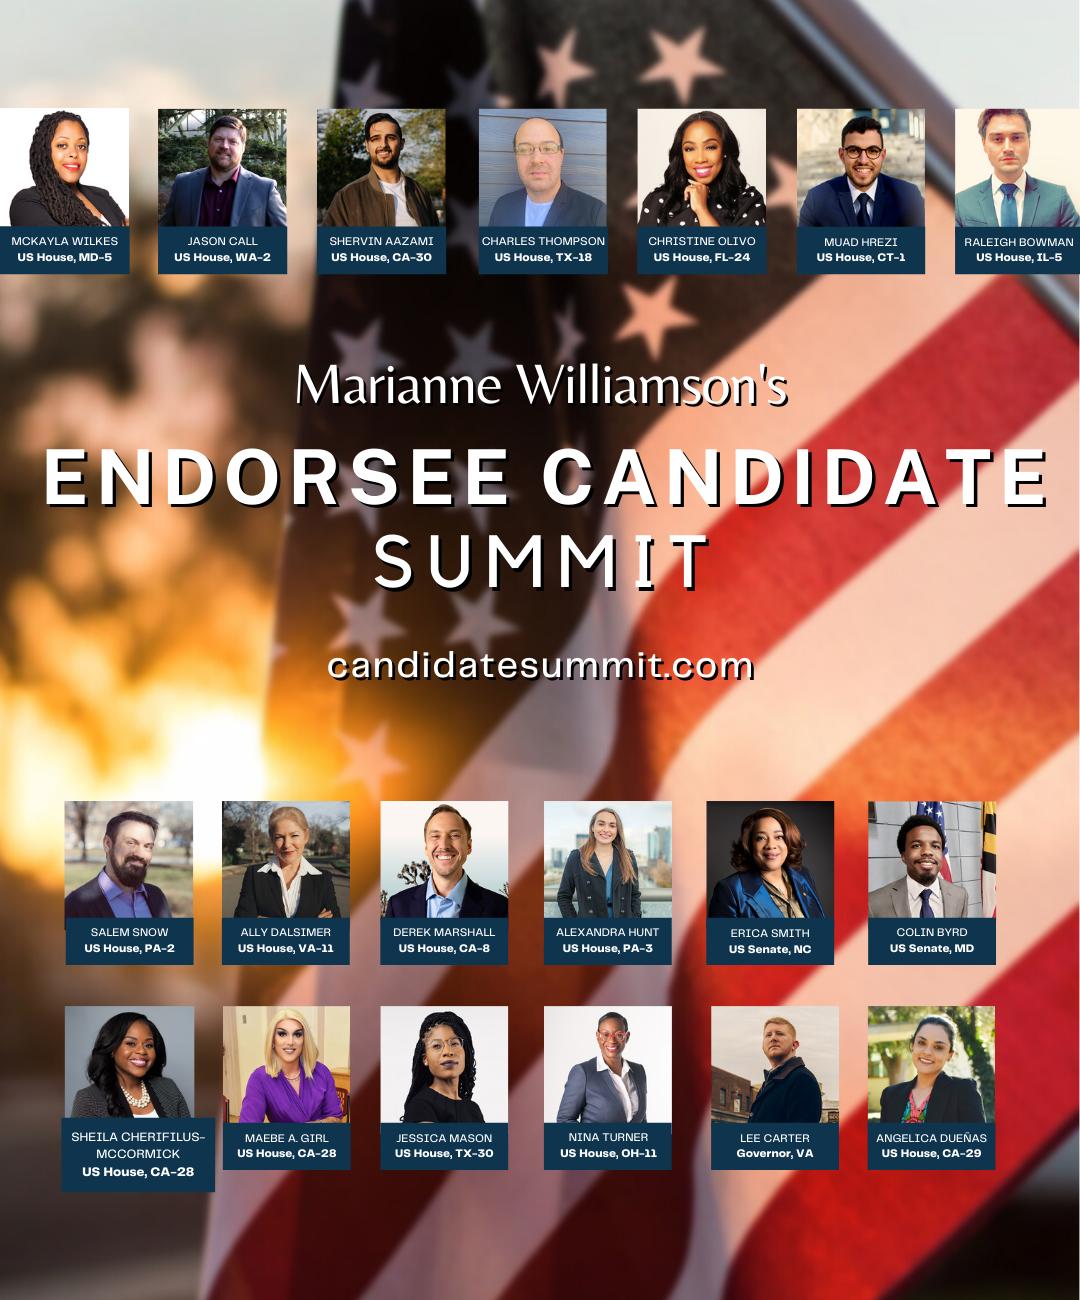 Marianne Williamson's Endorsee Candidate Summit